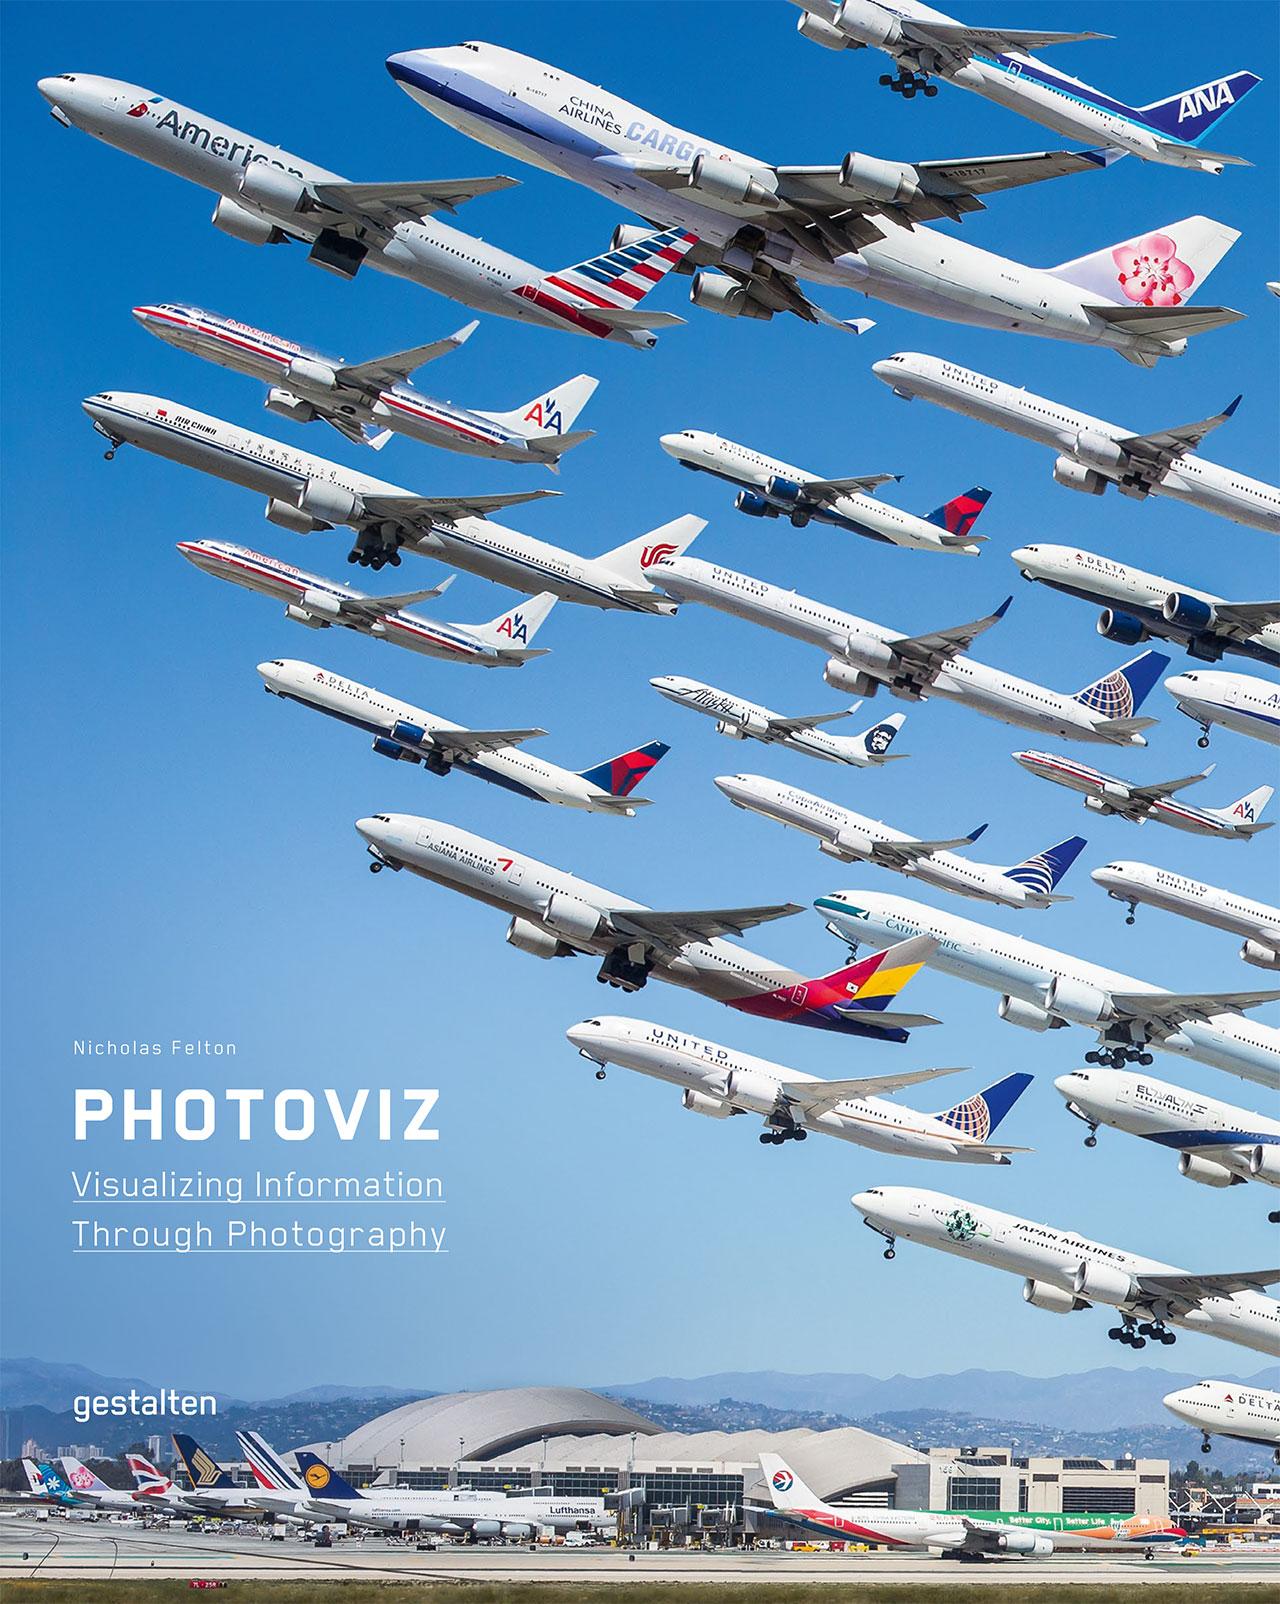 'PhotoViz'Book Cover©Gestalten2016.